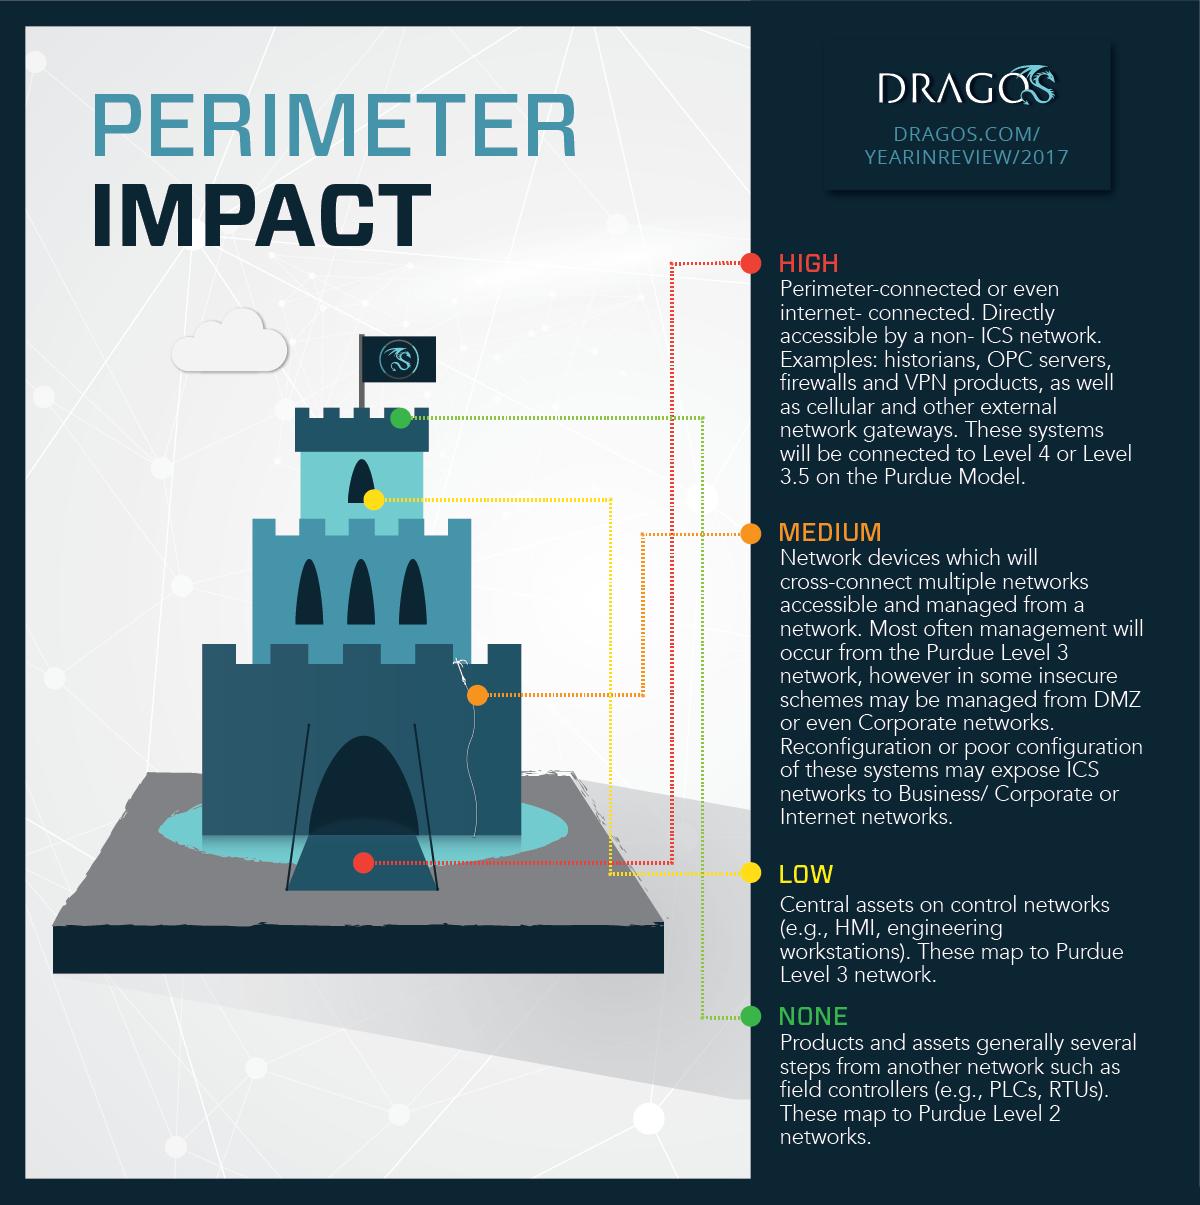 Infographic: Perimeter Impact